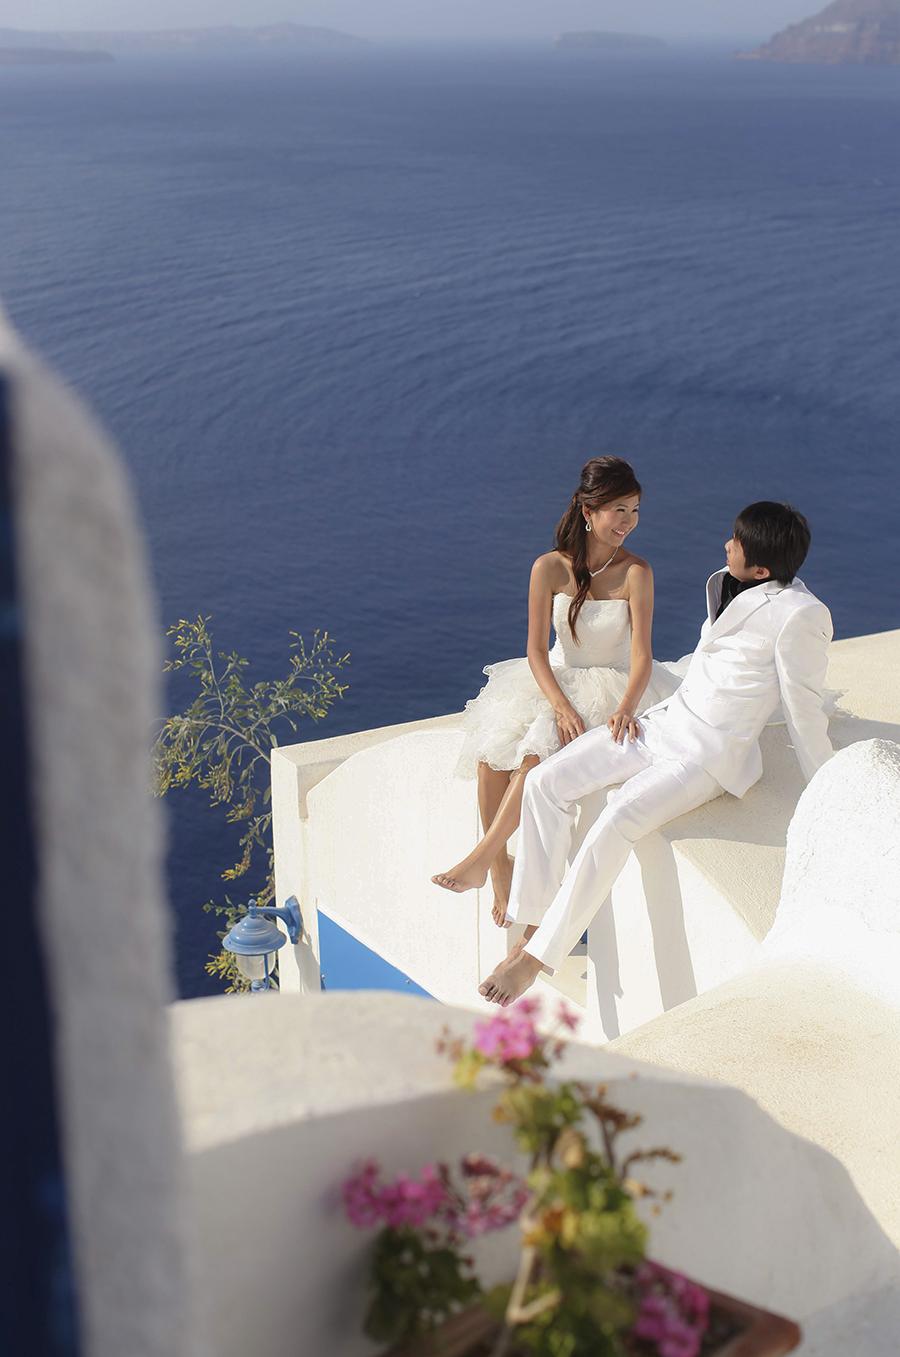 santorini greece . wedding photography by kurt ahs . 3085.jpg